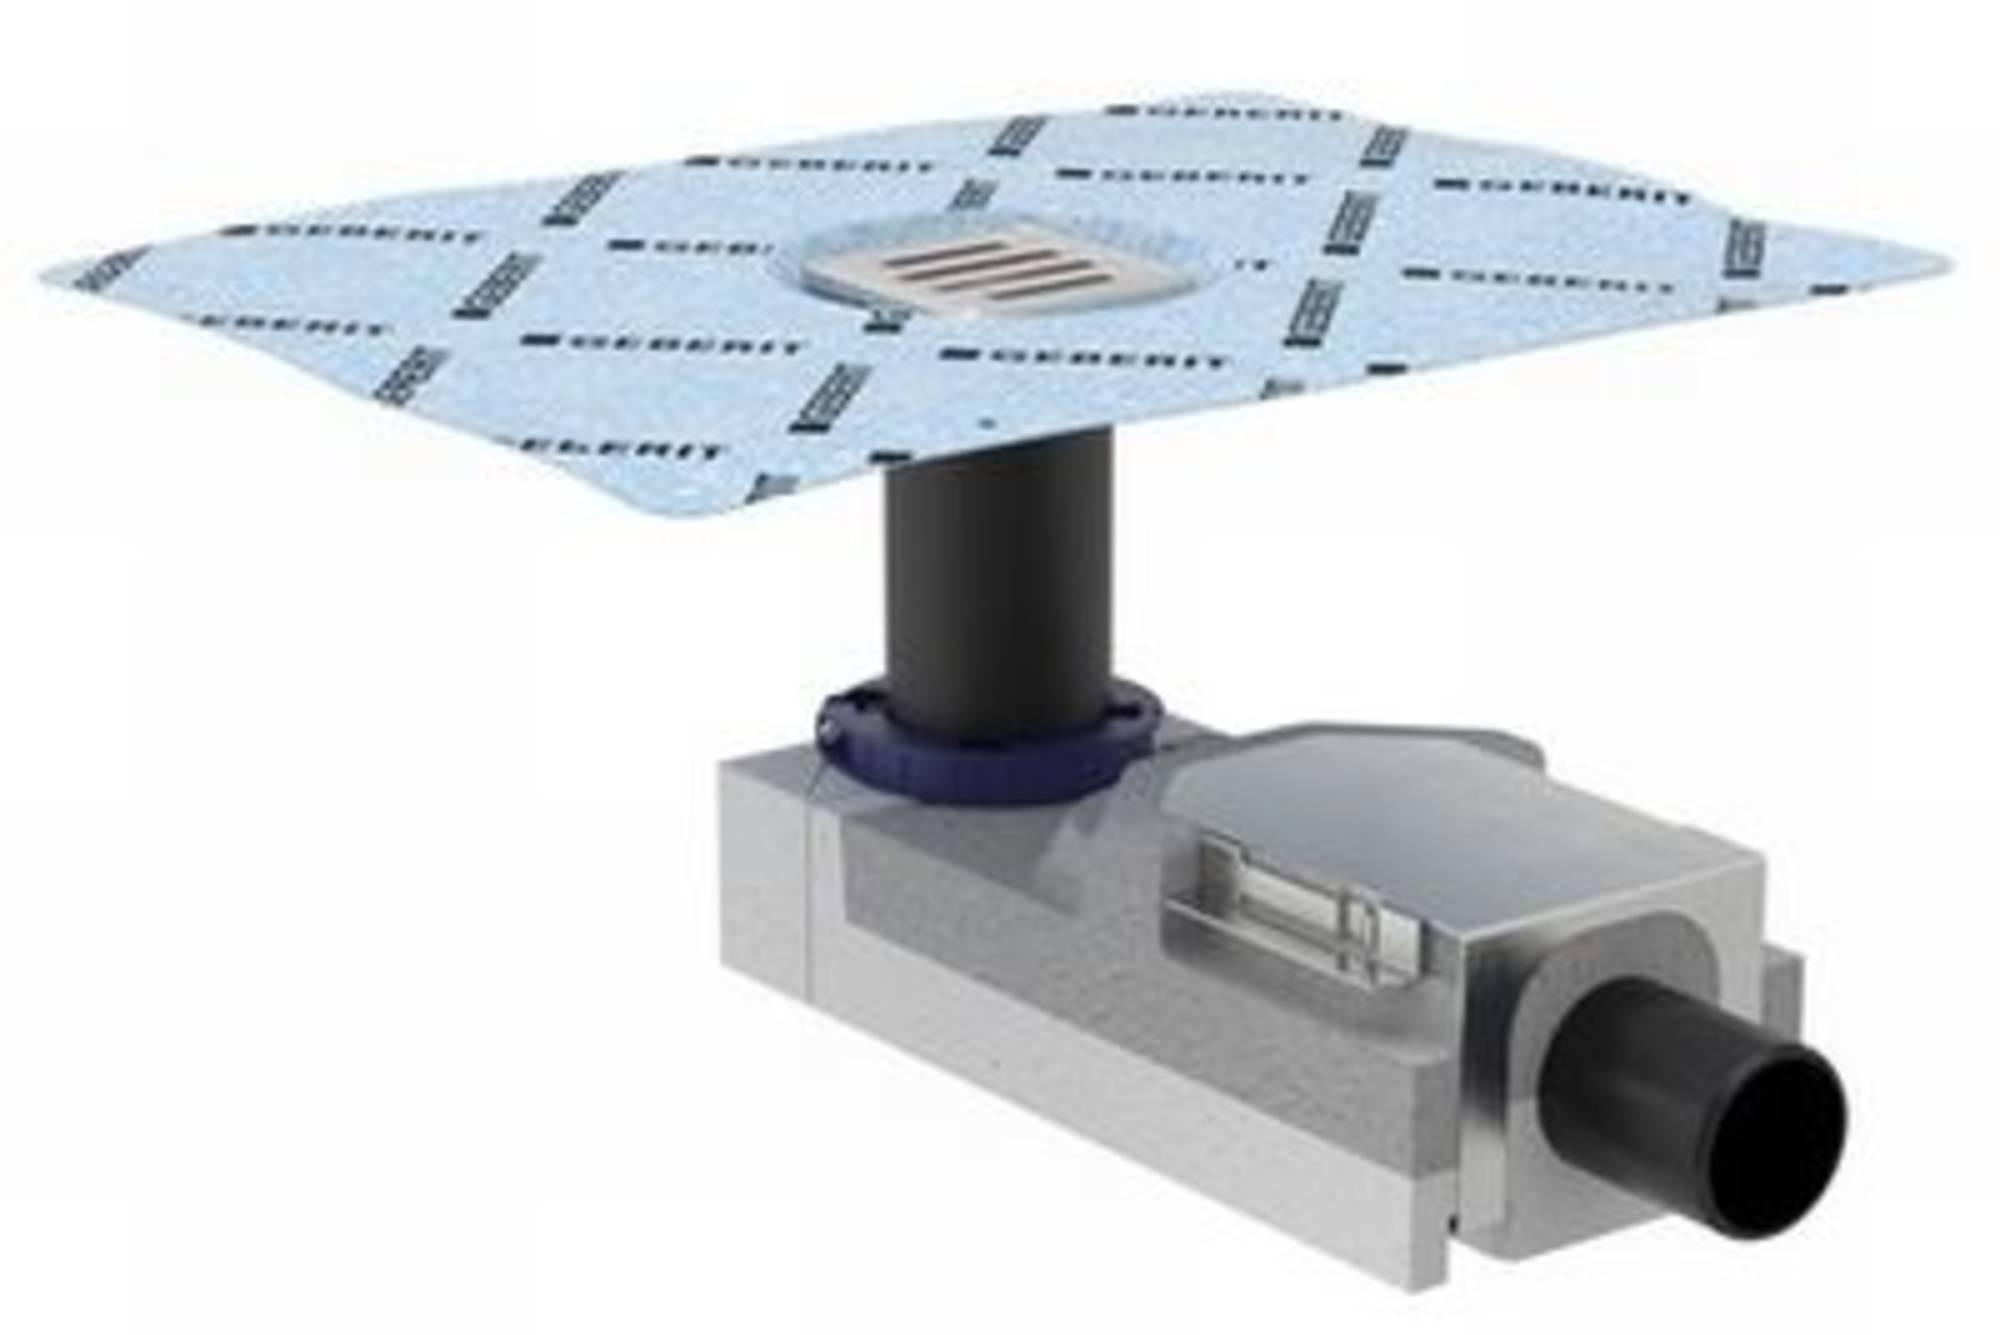 GEBERIT ruwbouwset vloerput sifonhoogte 50 mm. (154050001)